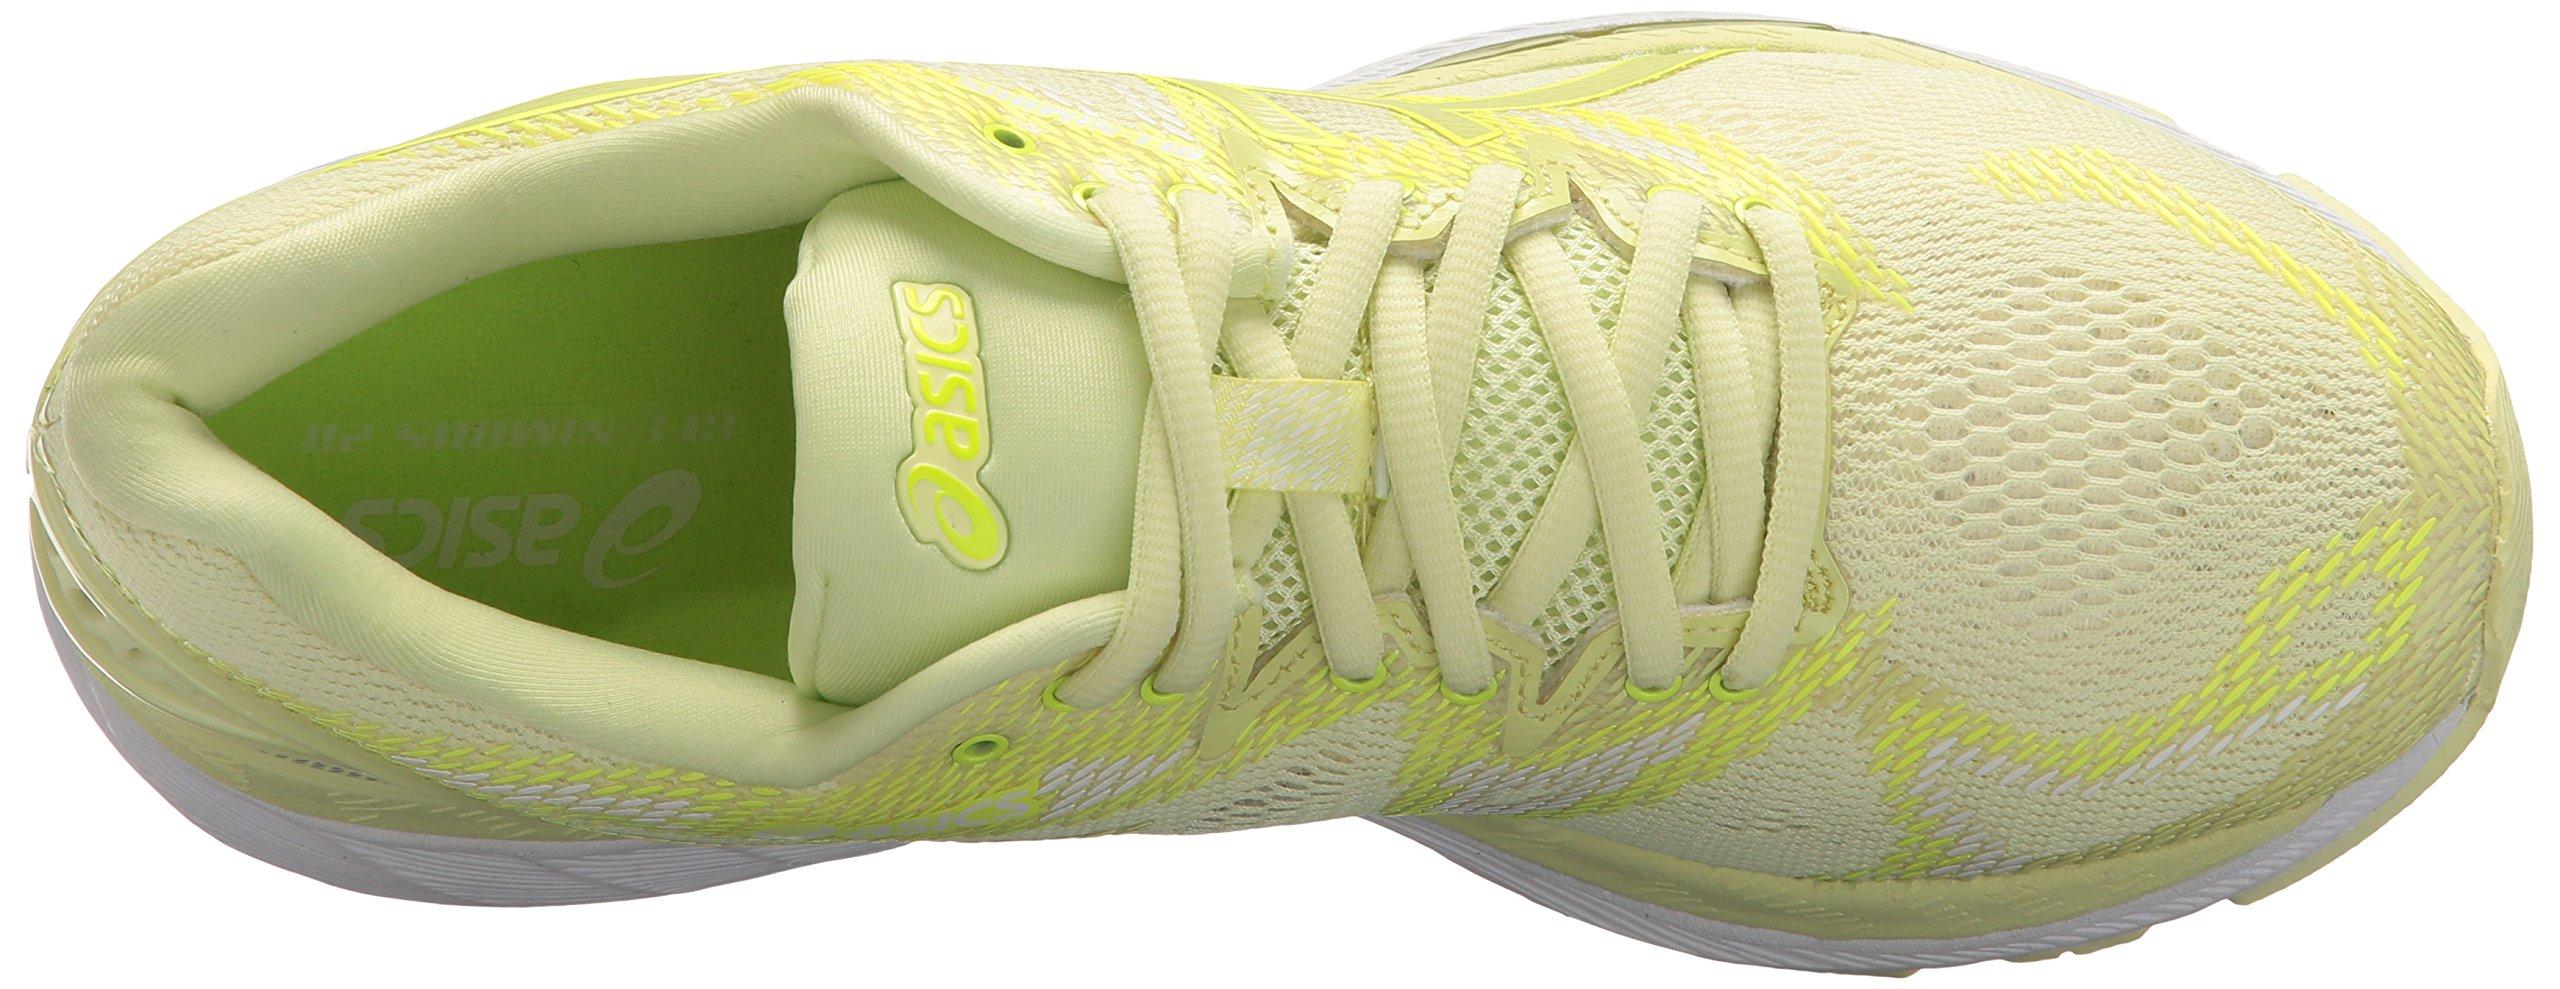 ASICS Women's Gel-Nimbus 20 Running Shoe, limelight/limelight/safety yellow, 5.5 Medium US by ASICS (Image #7)